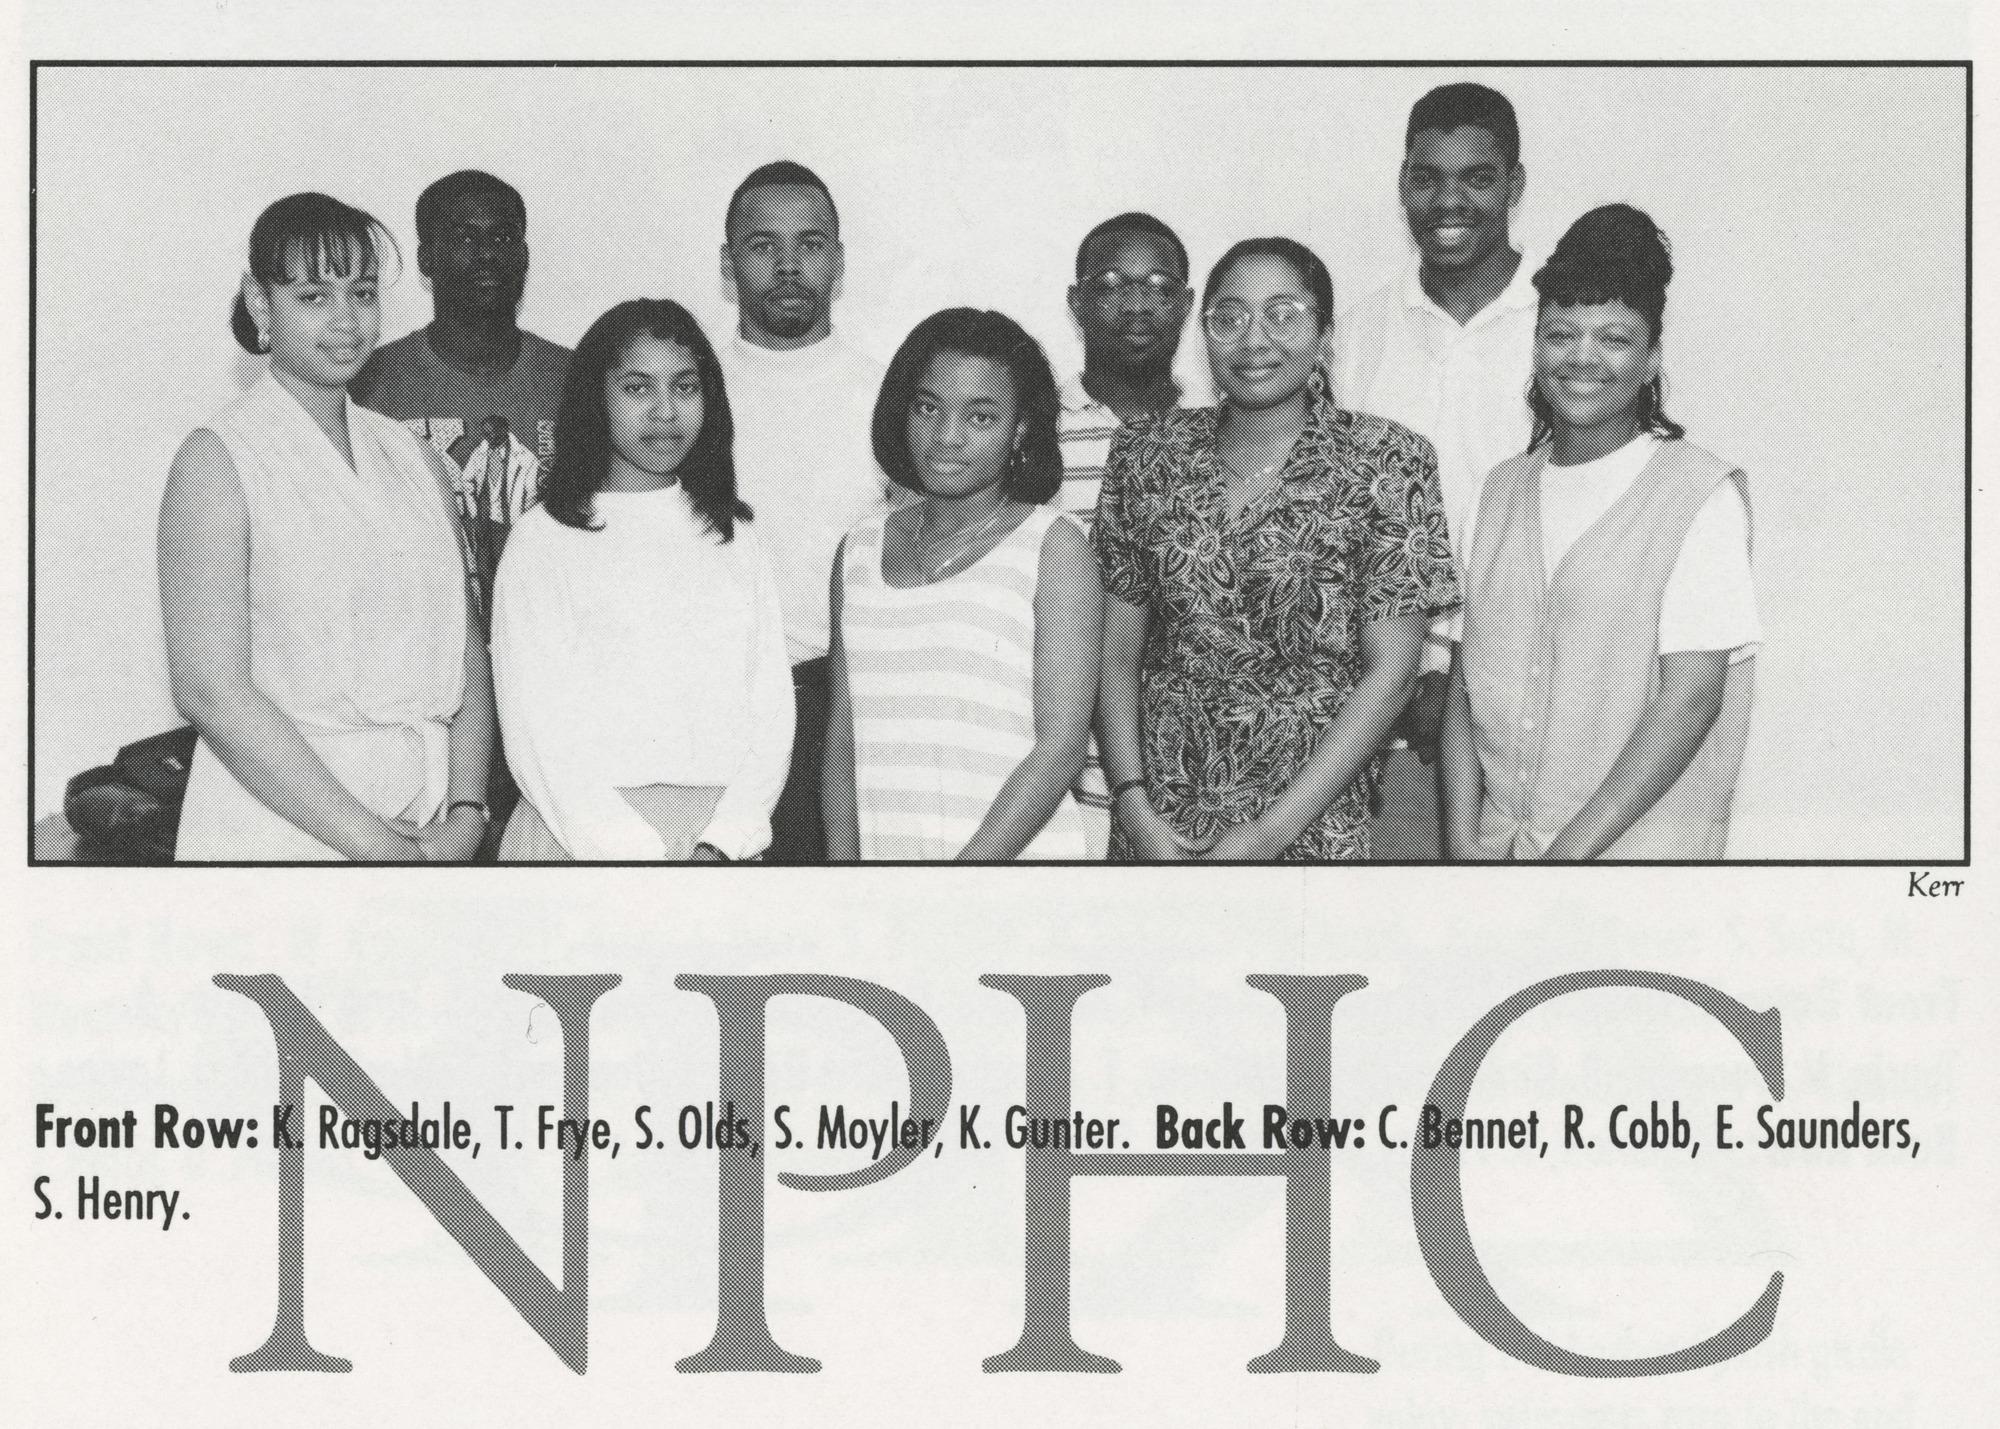 http://spec.lib.vt.edu/pickup/Omeka_upload/Bugle1994_pg88_NPHC.jpg